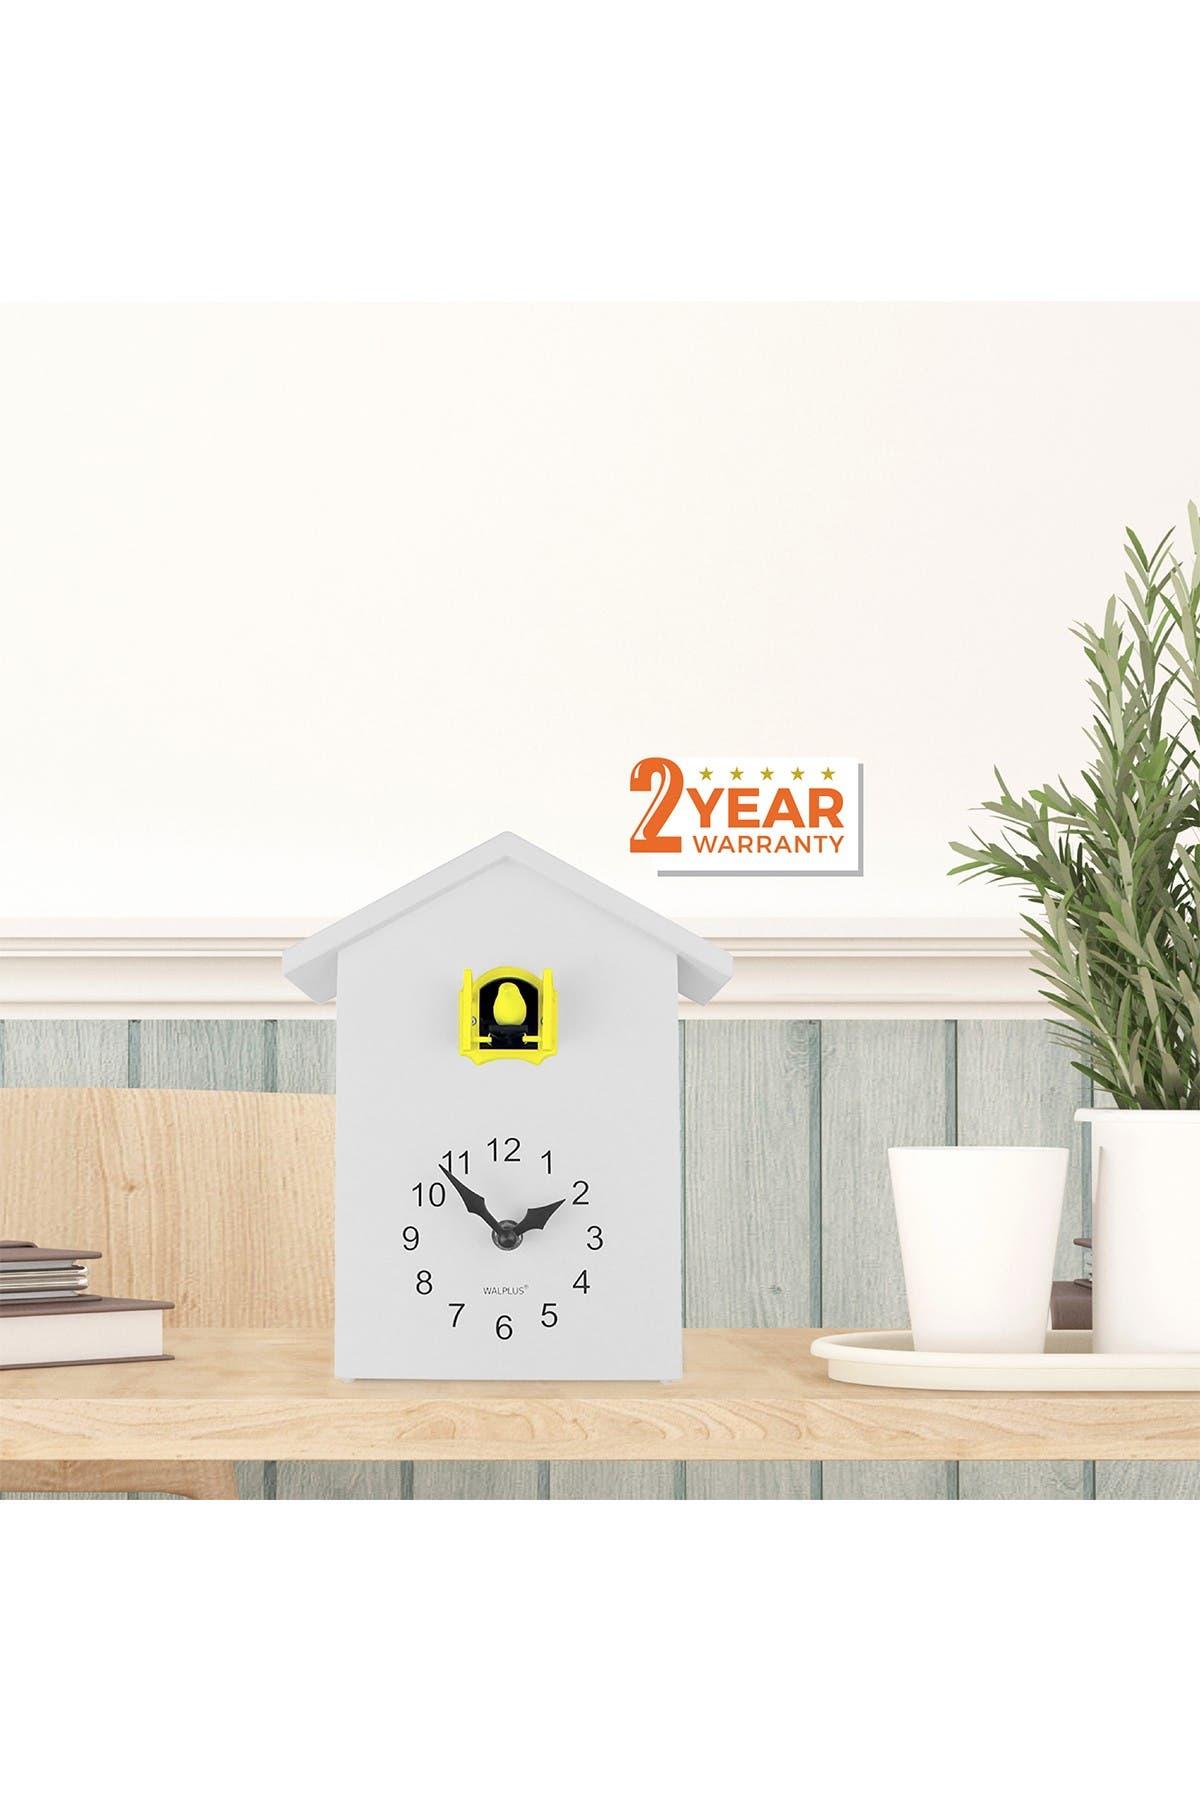 Image of WalPlus White Cuckoo Table Clock - Yellow Window